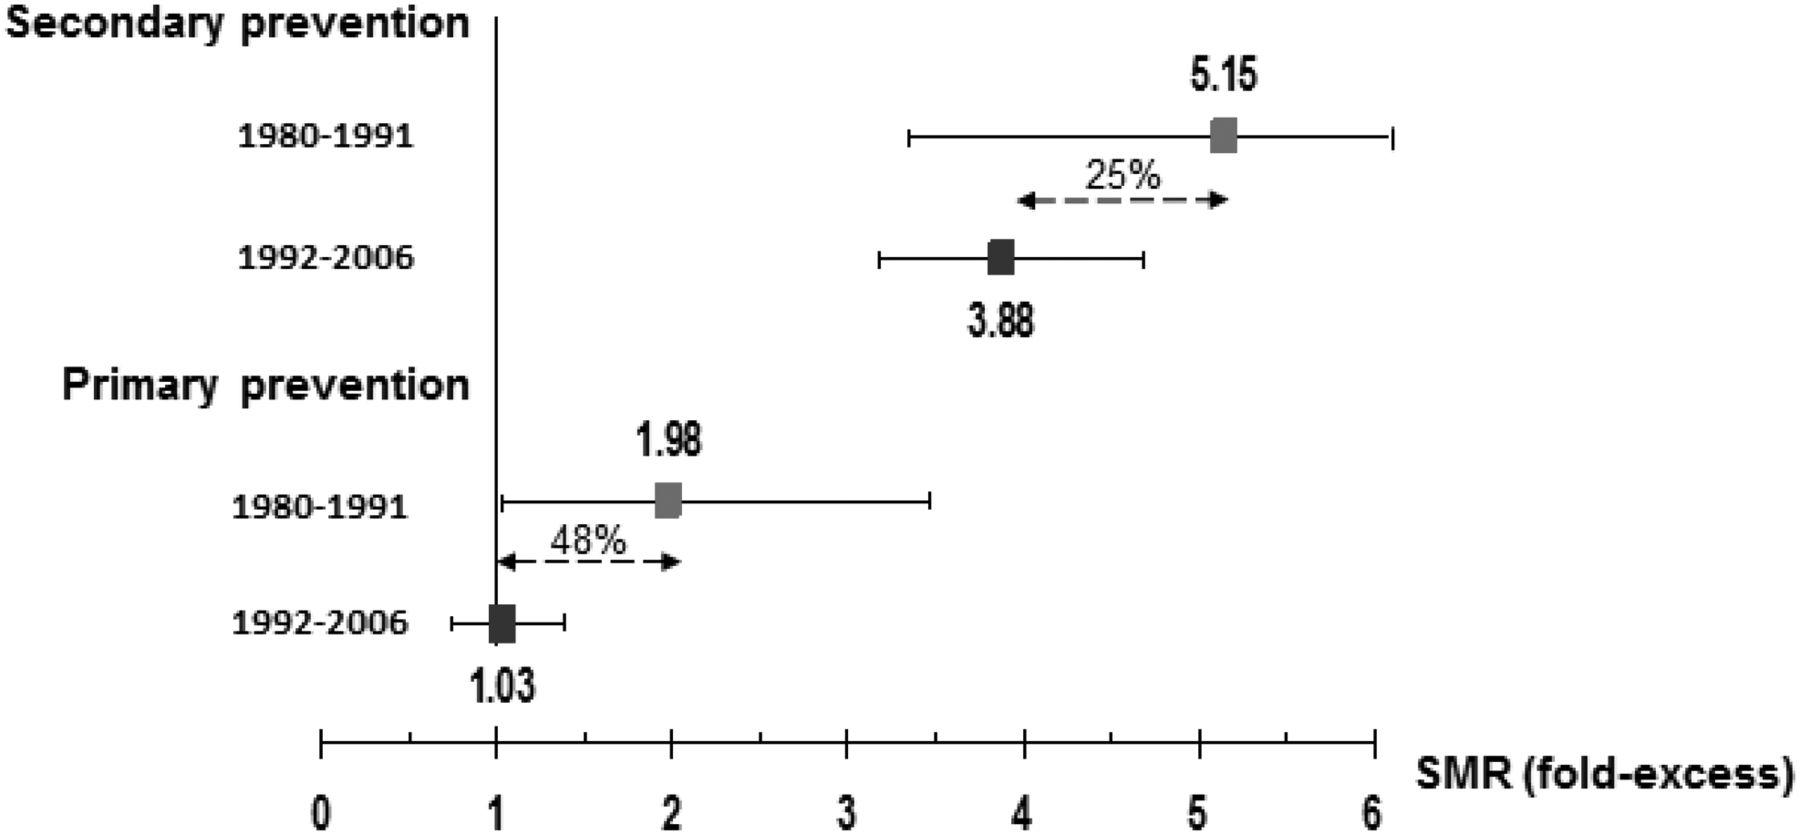 inheritance pattern of familial hypercholesterolemia